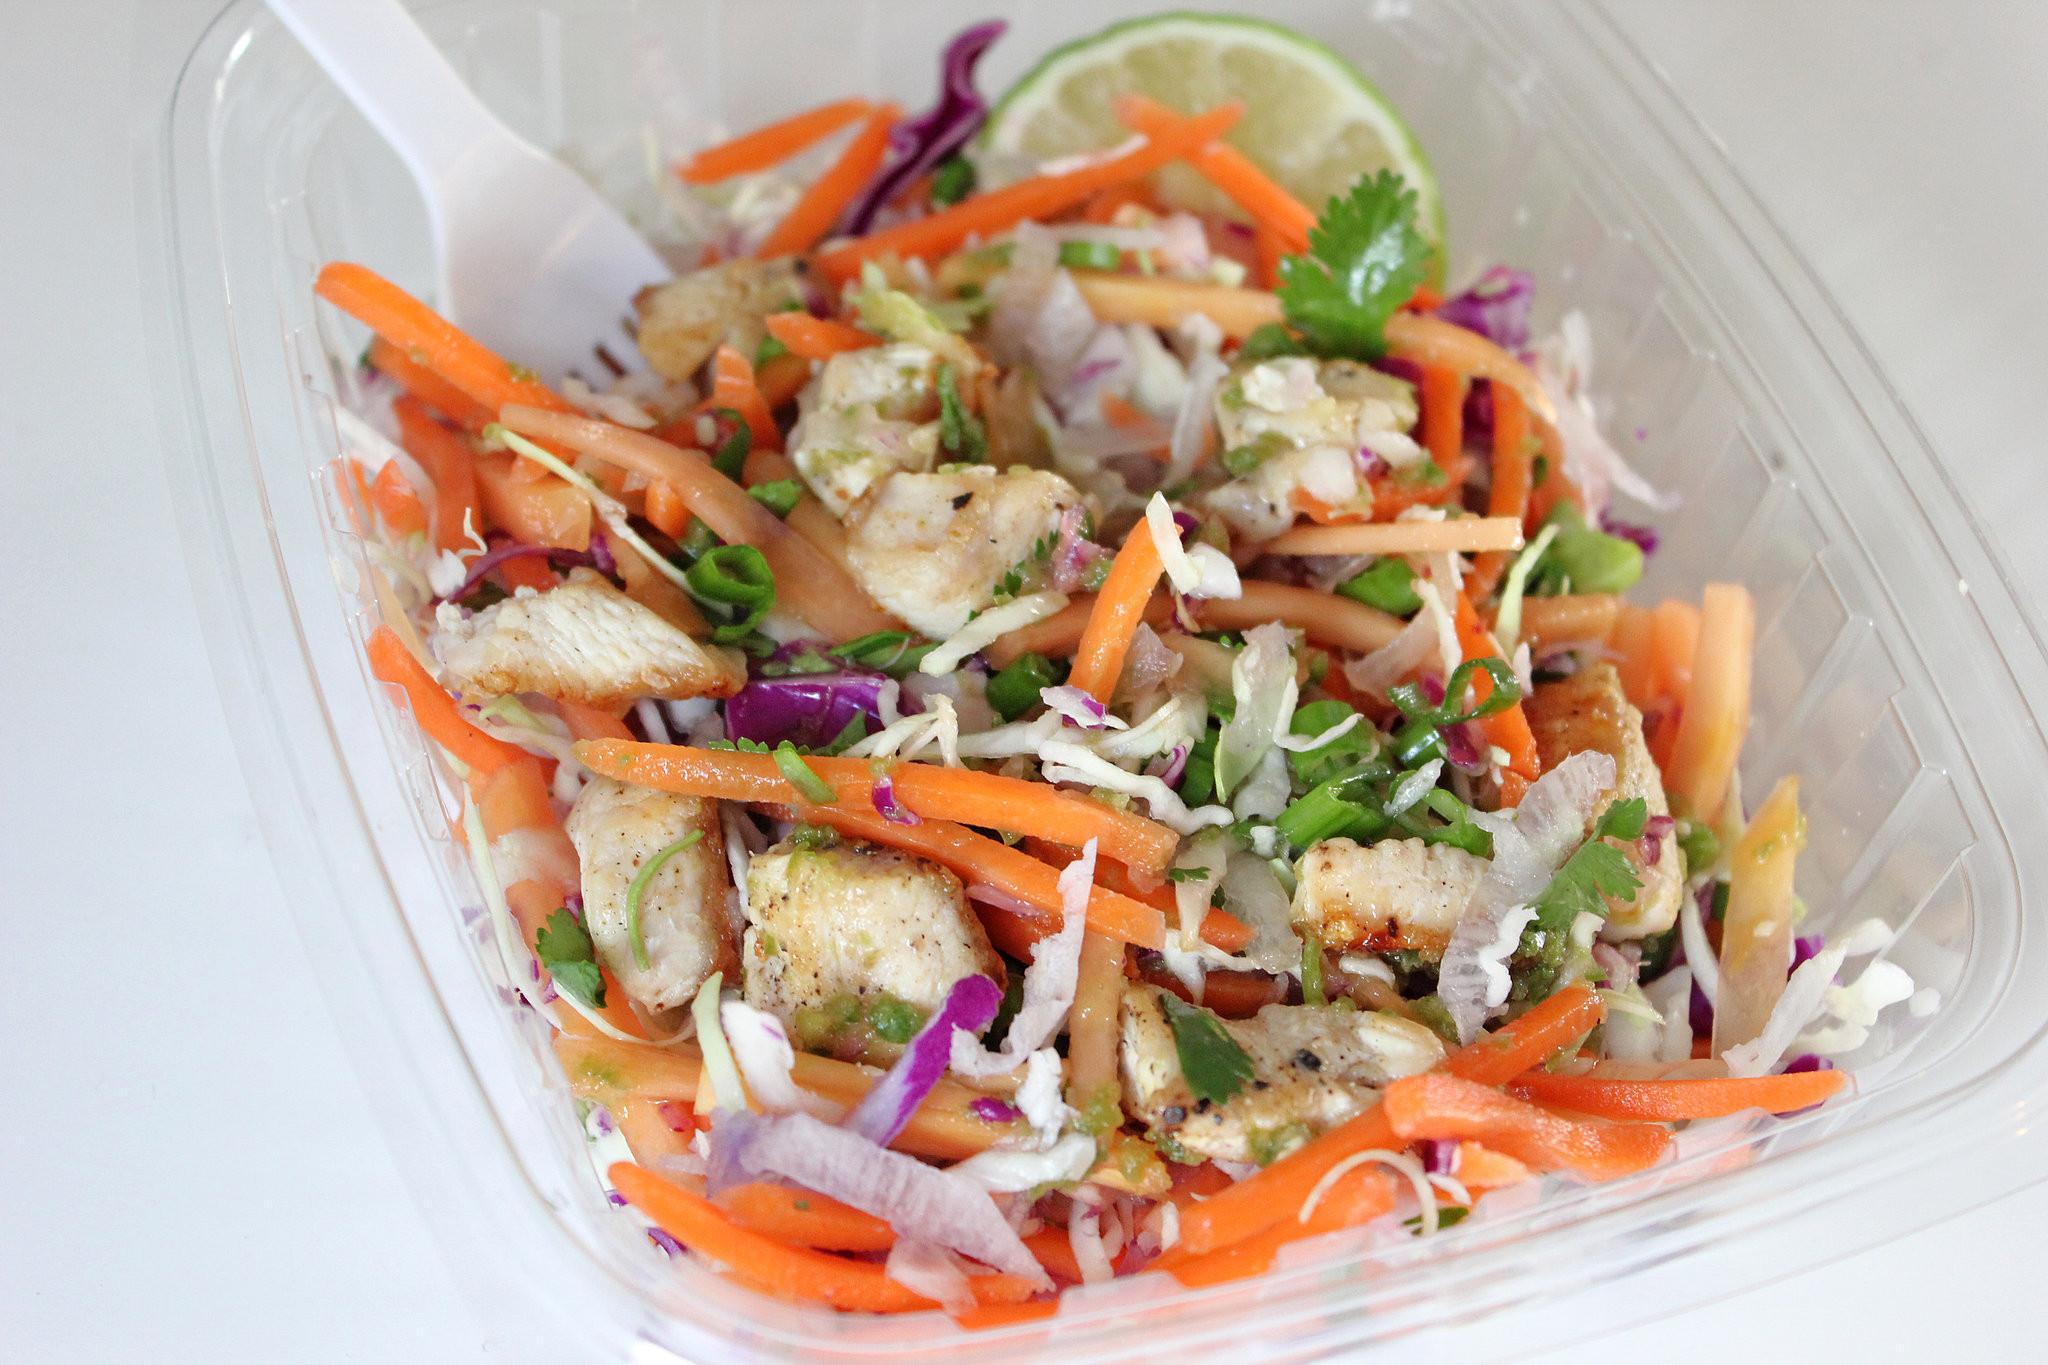 Low Fat Chicken Salad Recipe  Trader Joe s Low Calorie Citrus Chicken Salad Recipe